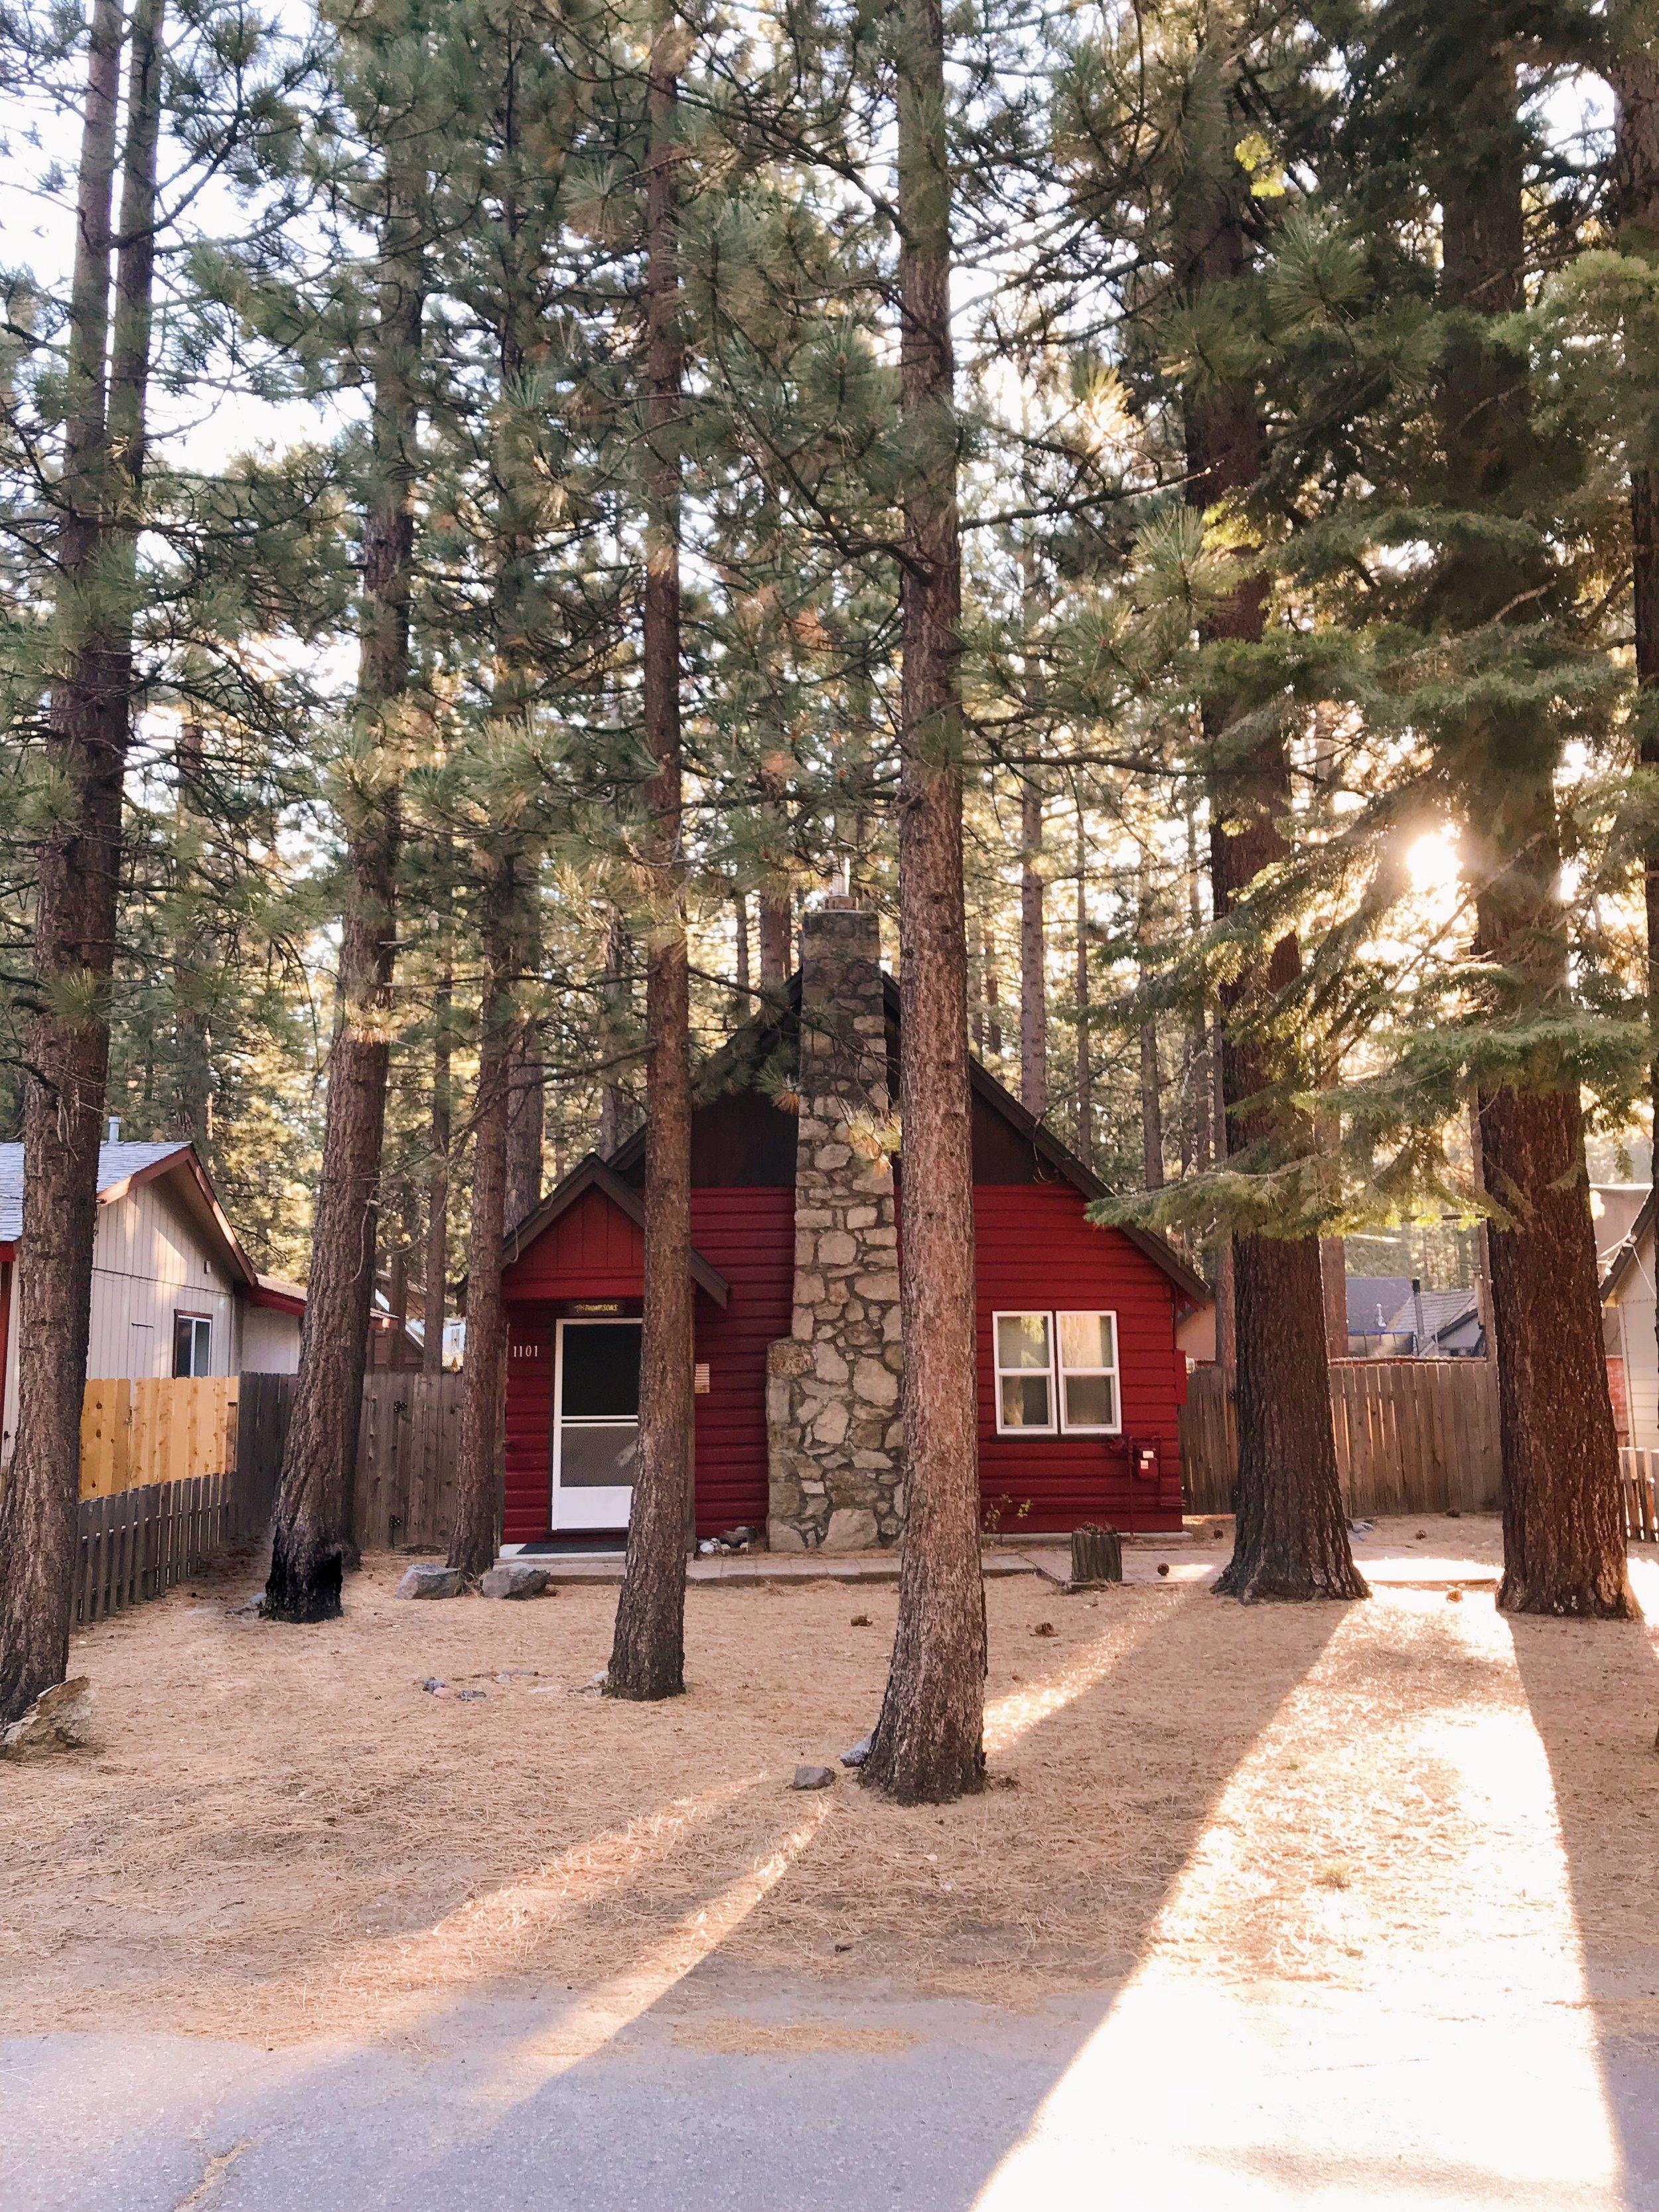 An Impromptu Weekend in South Lake Tahoe | Freckled Italian